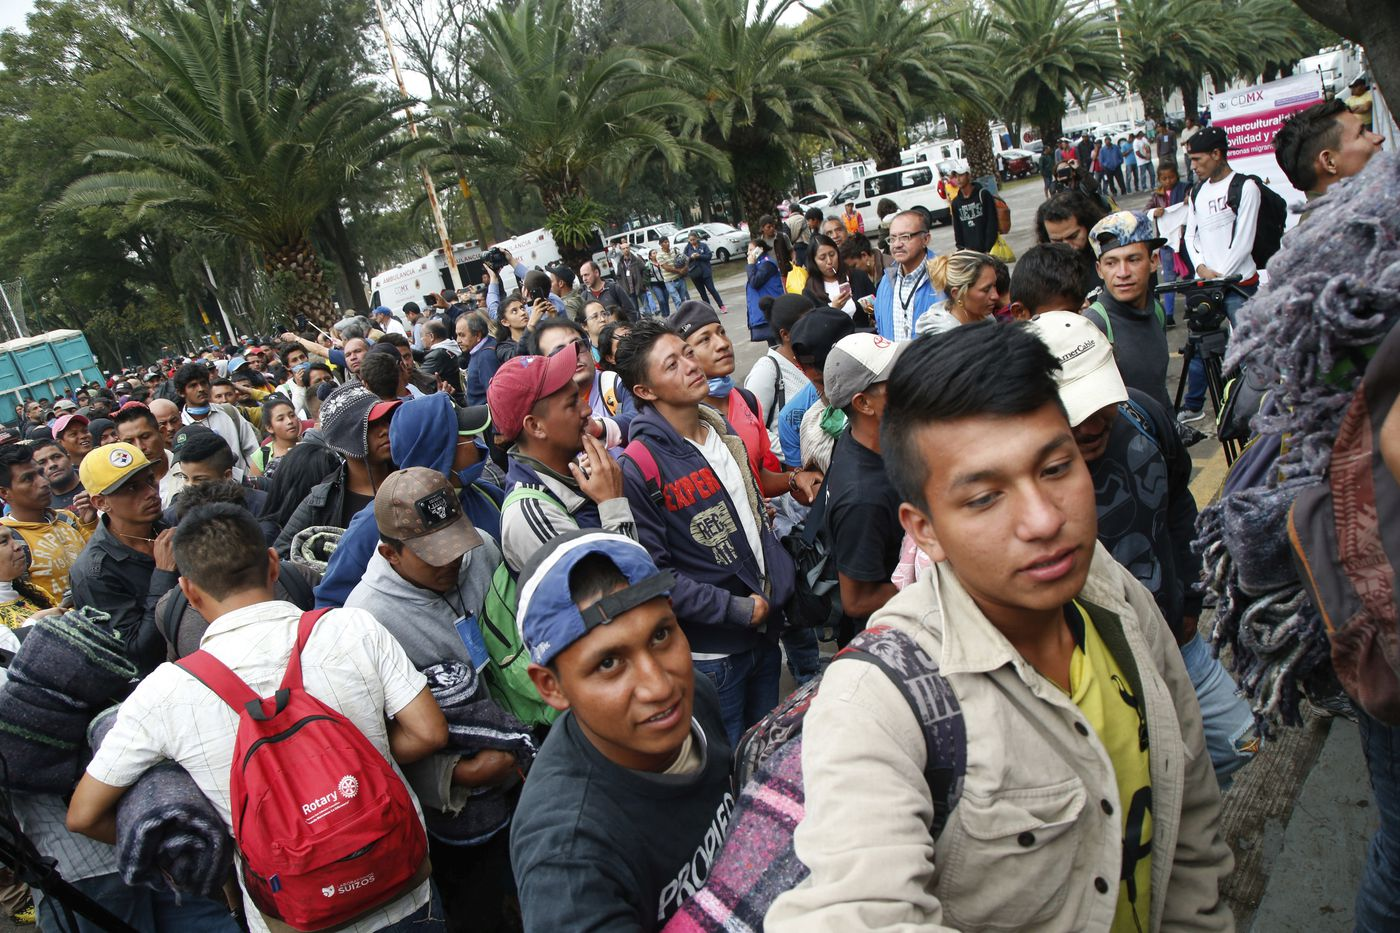 Central Americans' long walk north strikes familiar chords | Solomon Jones